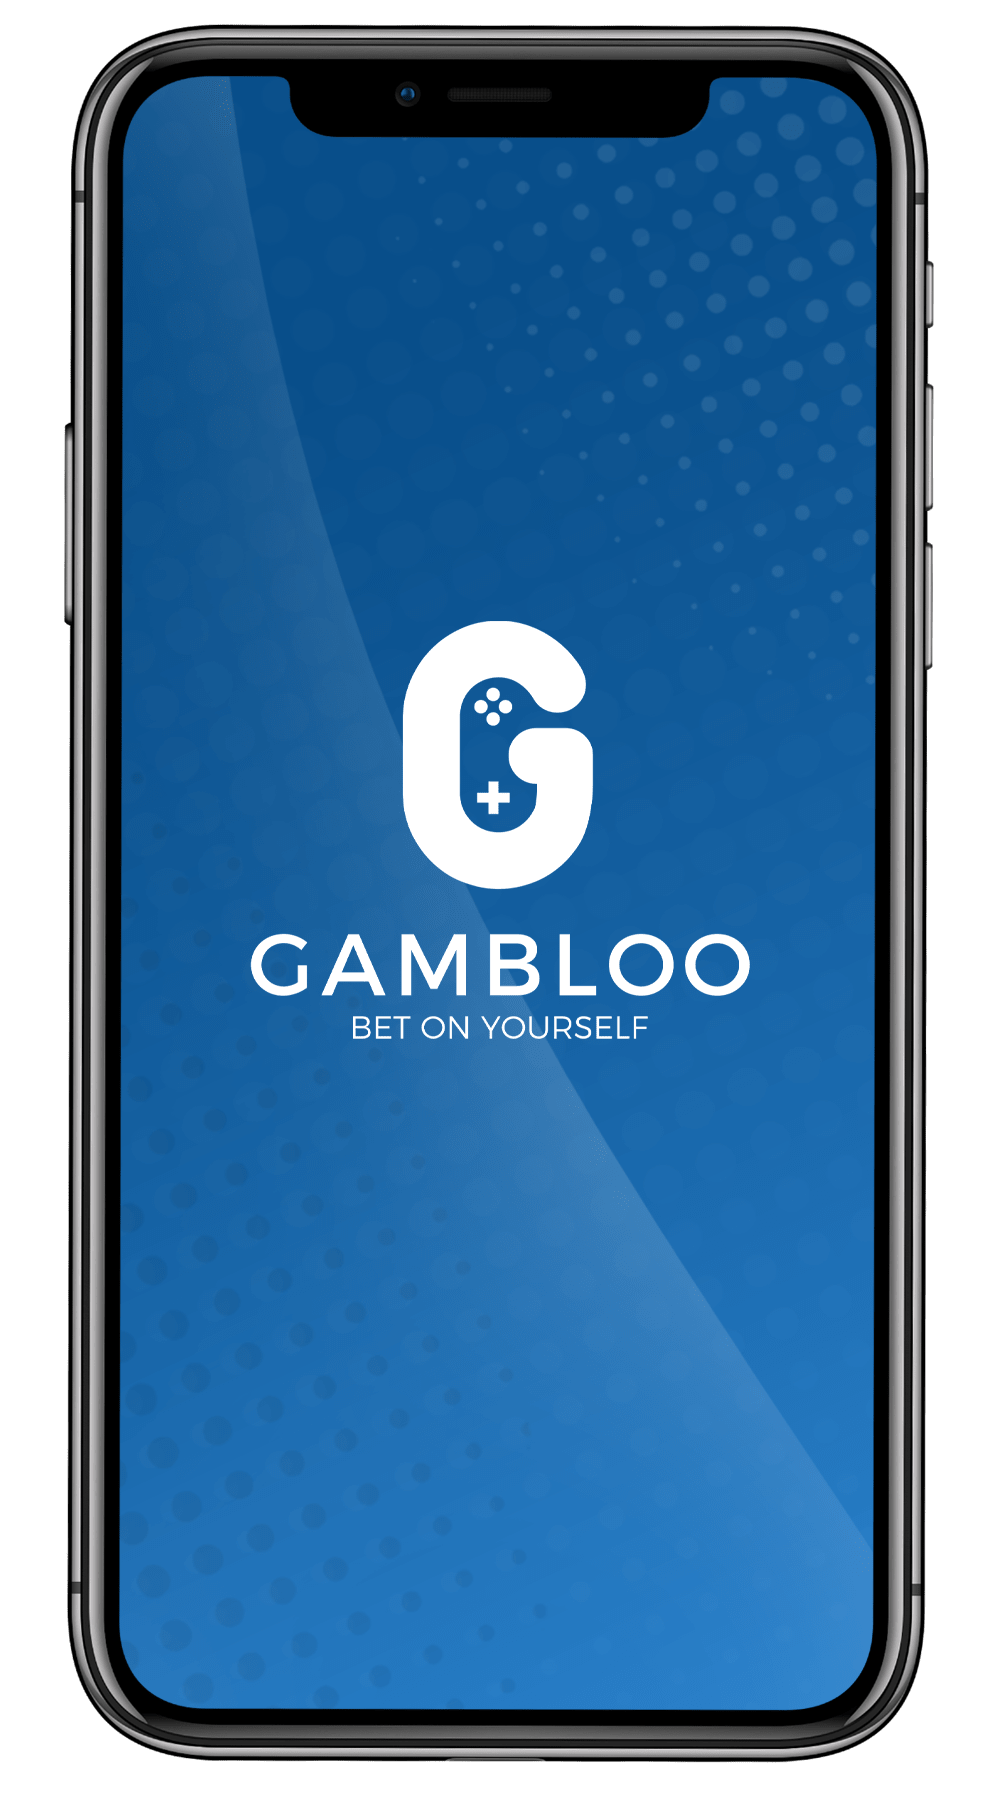 Gambloo IOS app